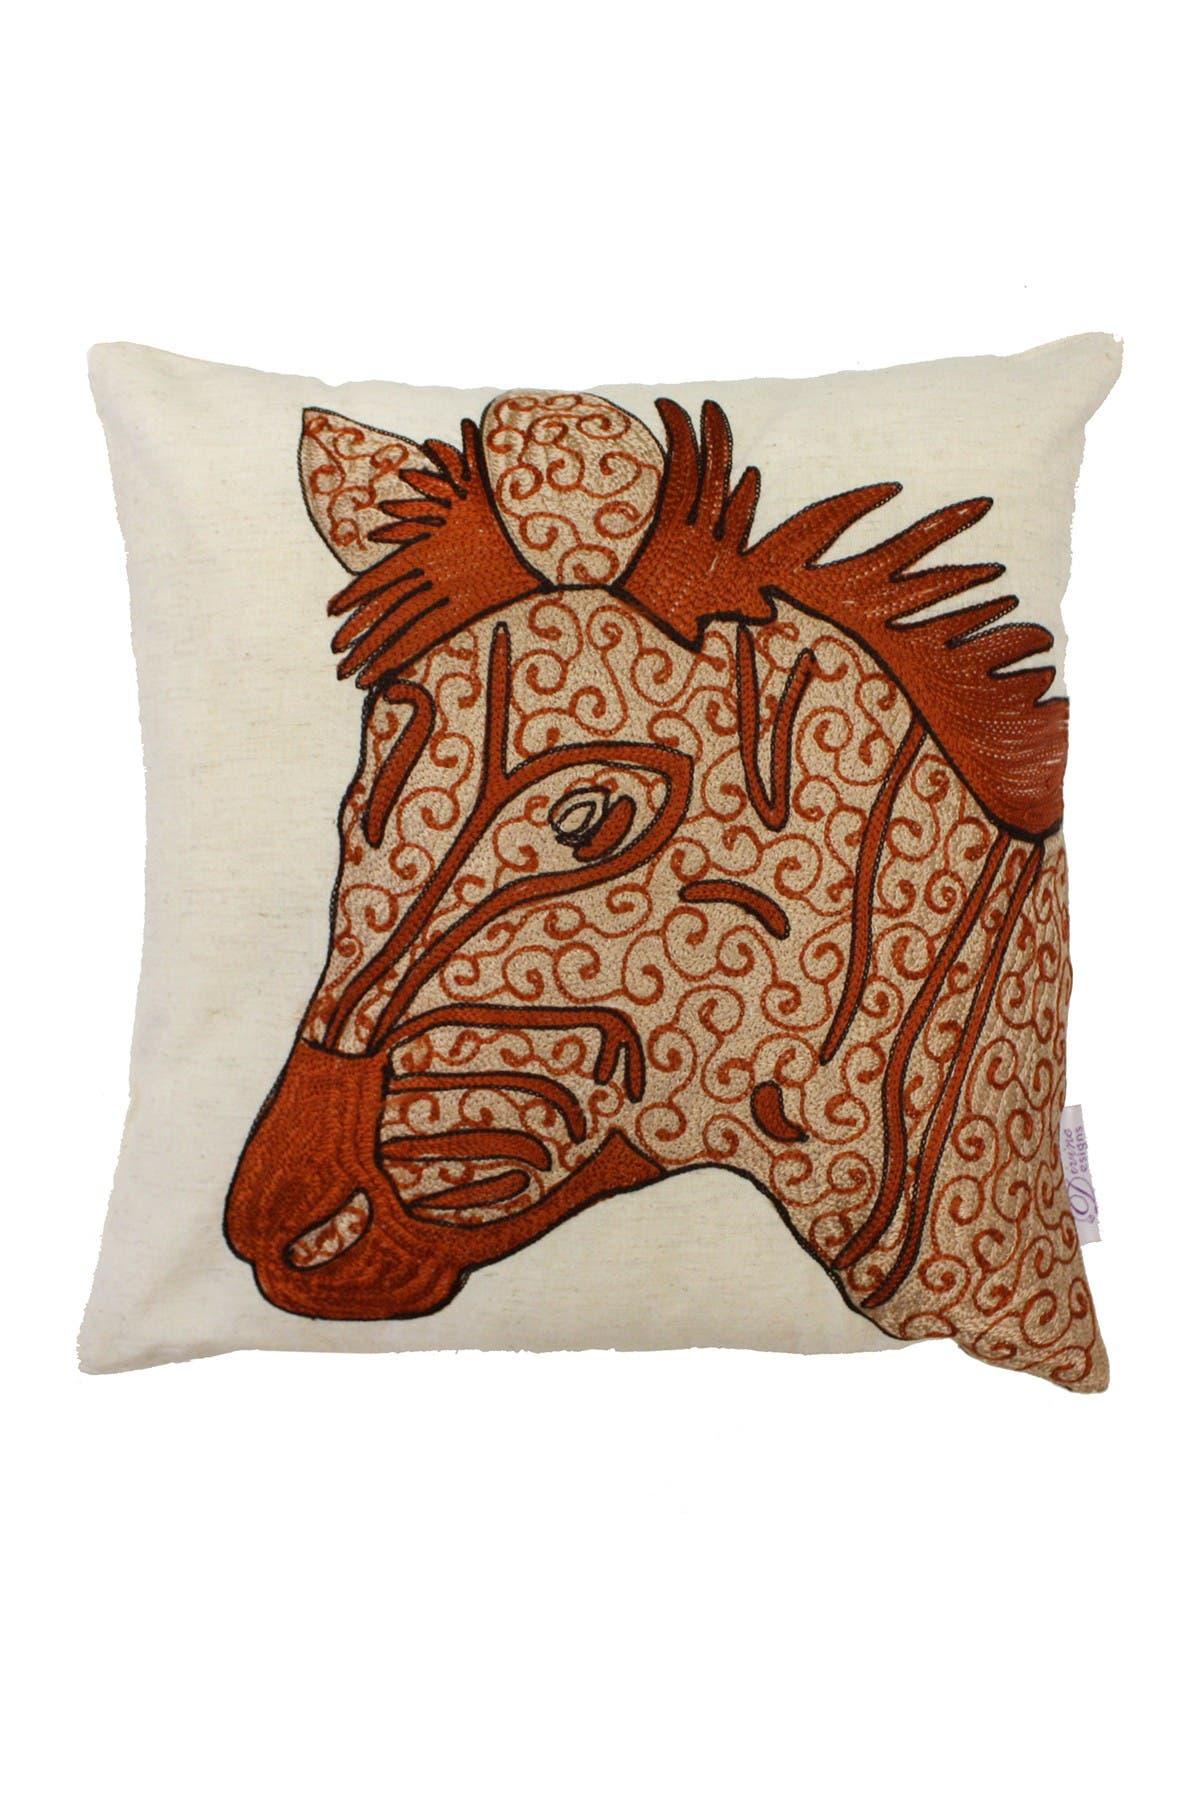 "Image of DIVINE HOME Dori Embroidered Zebra Throw Pillow - 16""x16"""